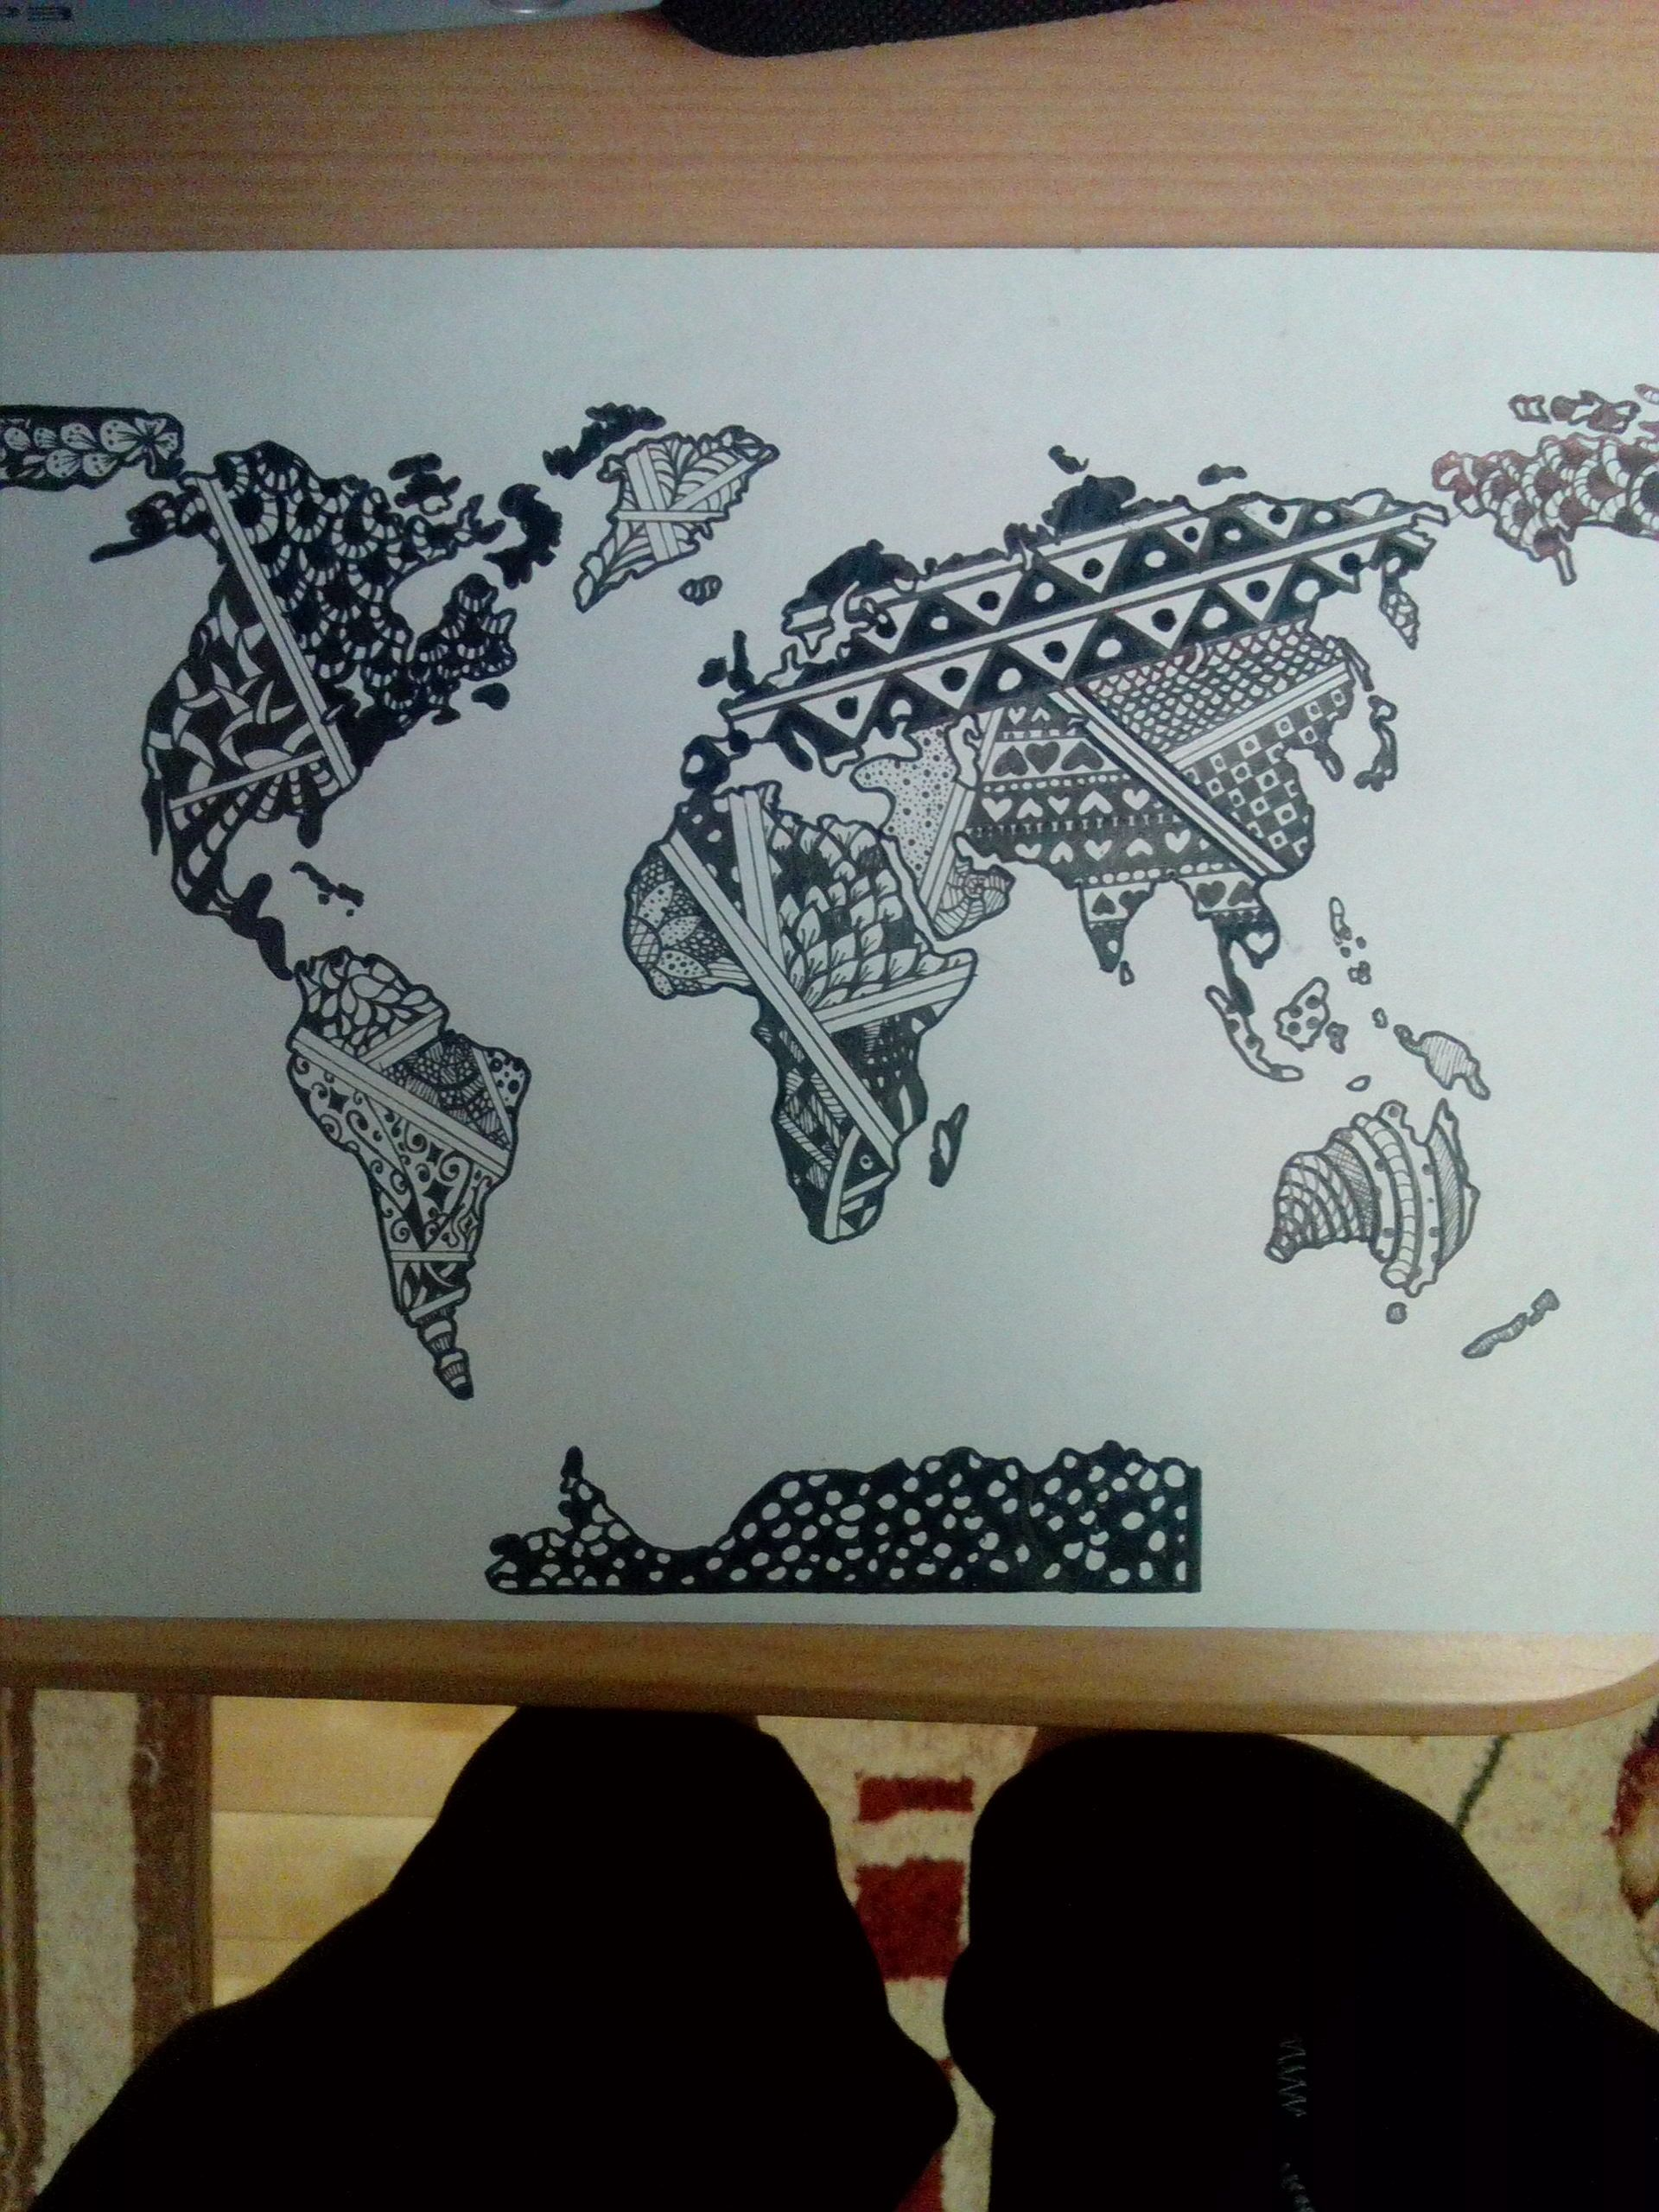 Zentangle map of the world zentangle pinterest mapas y arte zentangle map of the world gumiabroncs Images